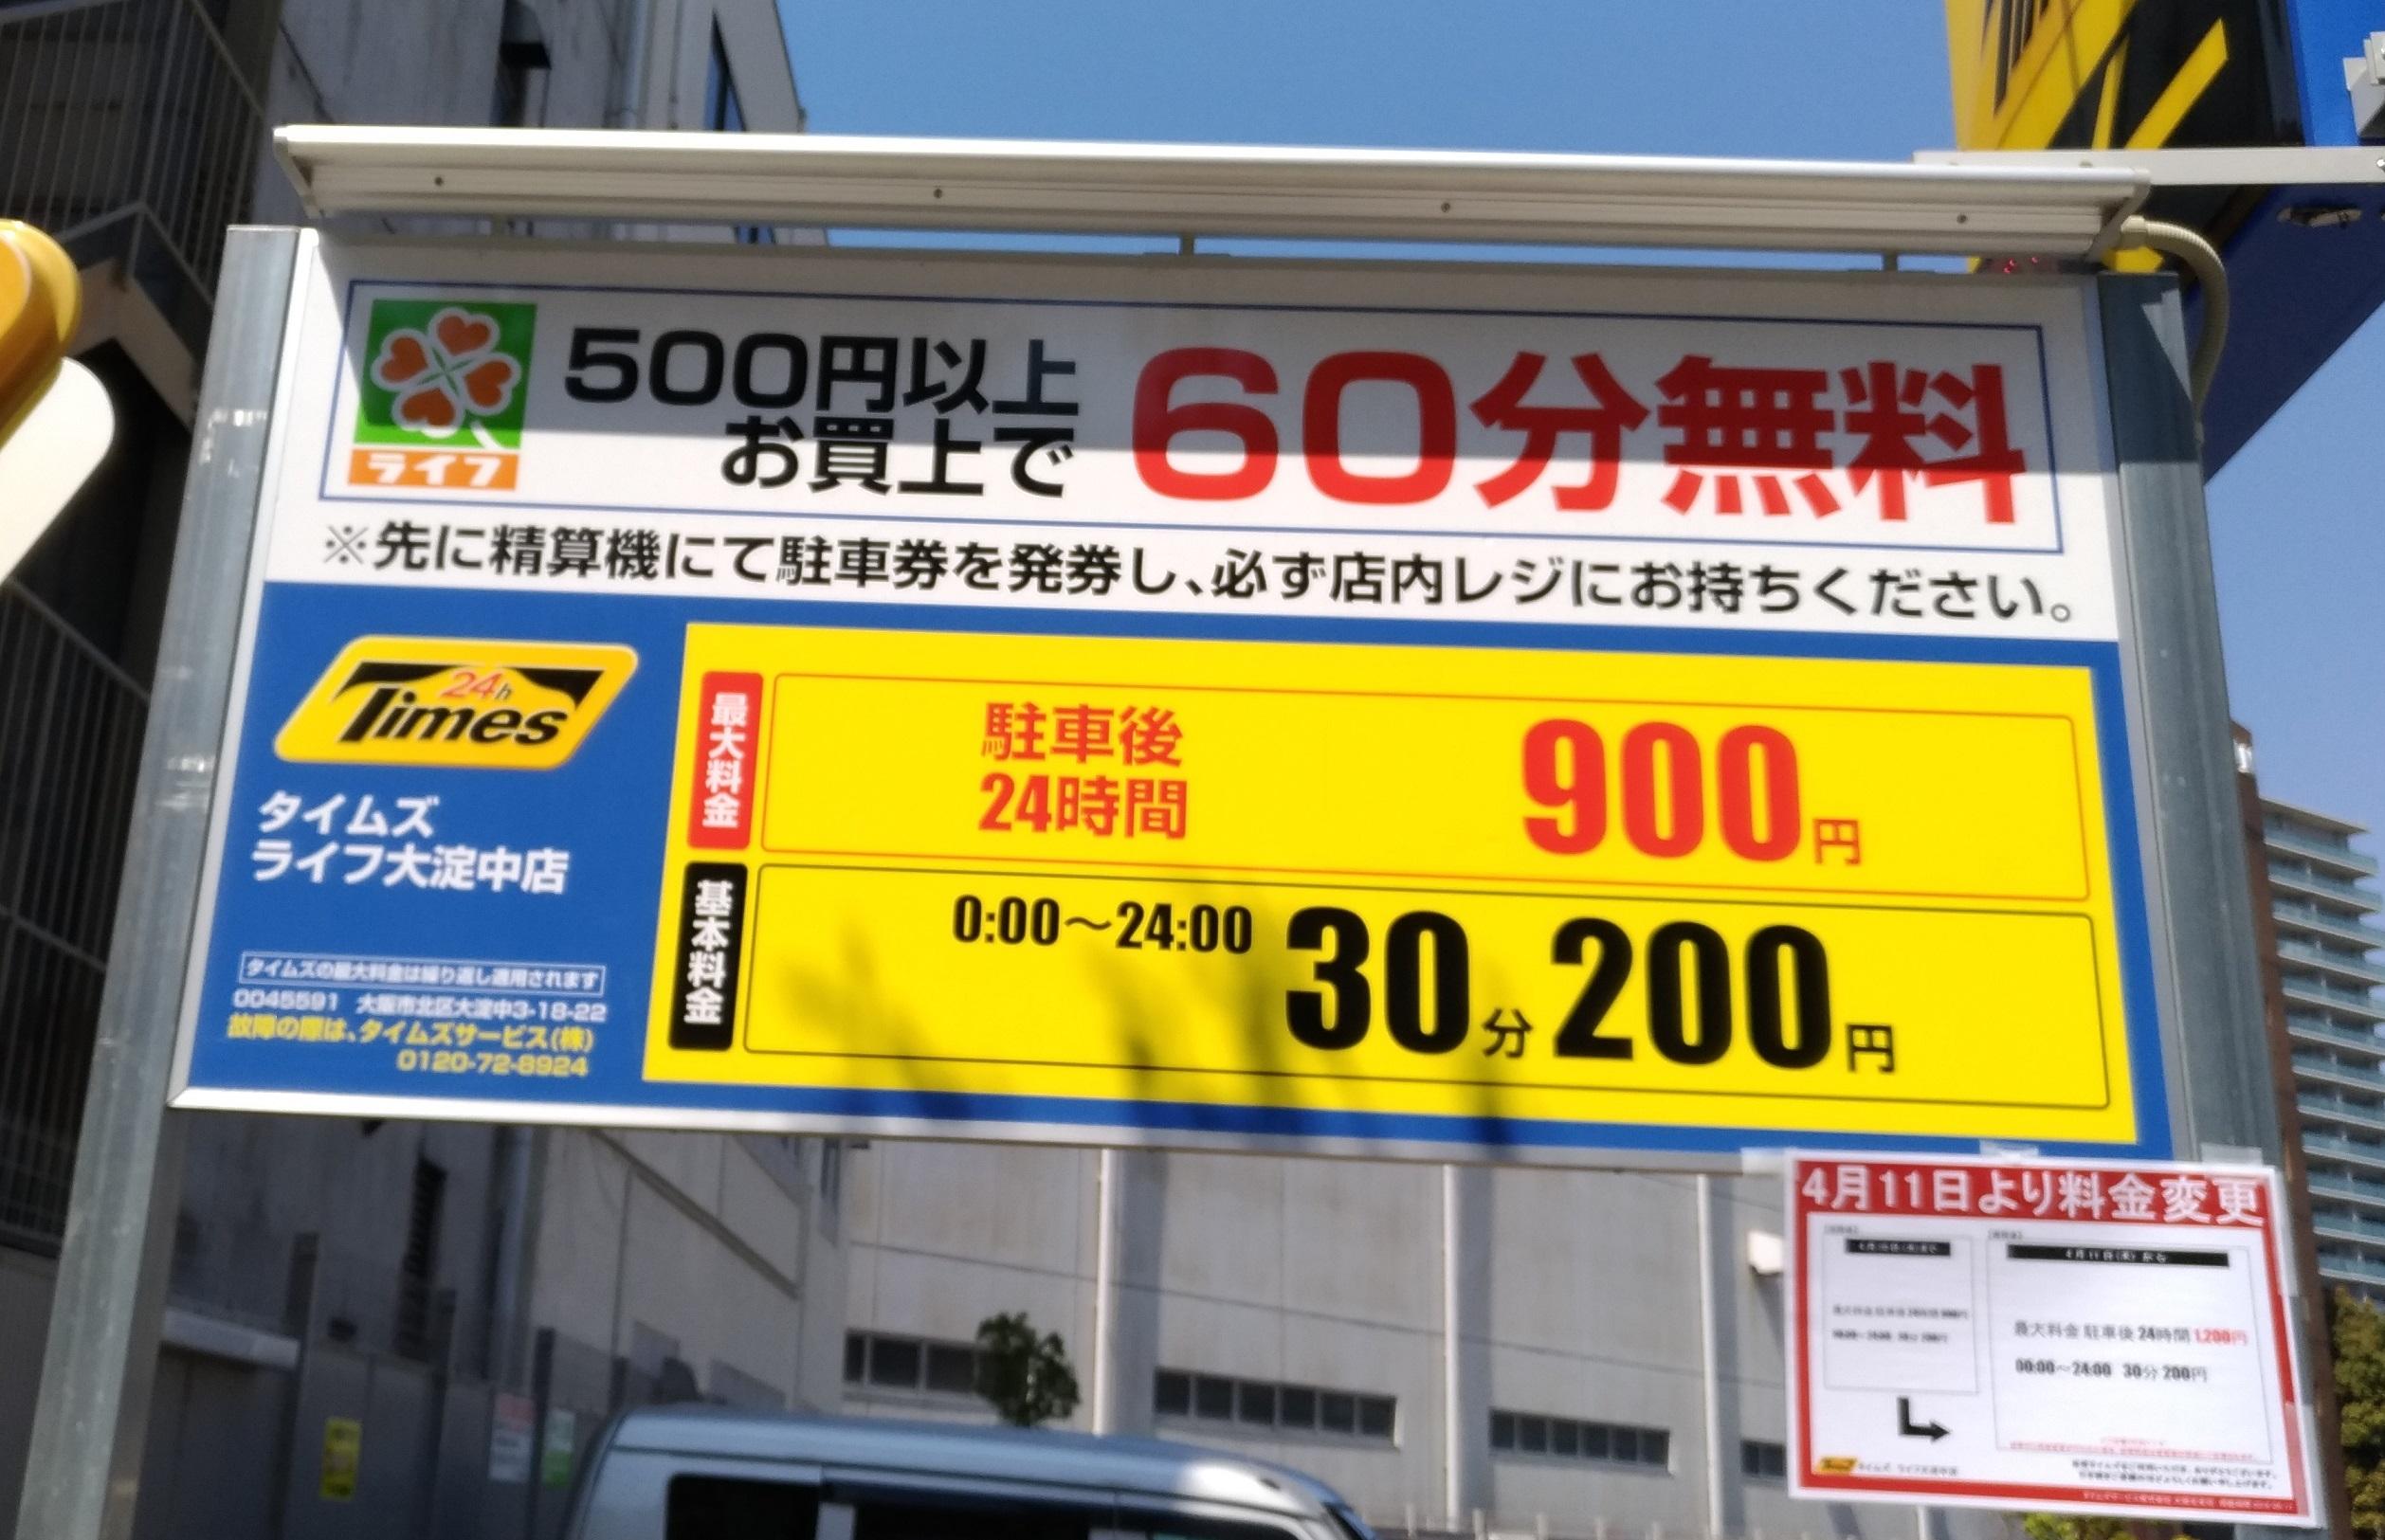 osaka_life_super_times_parking_3.jpg